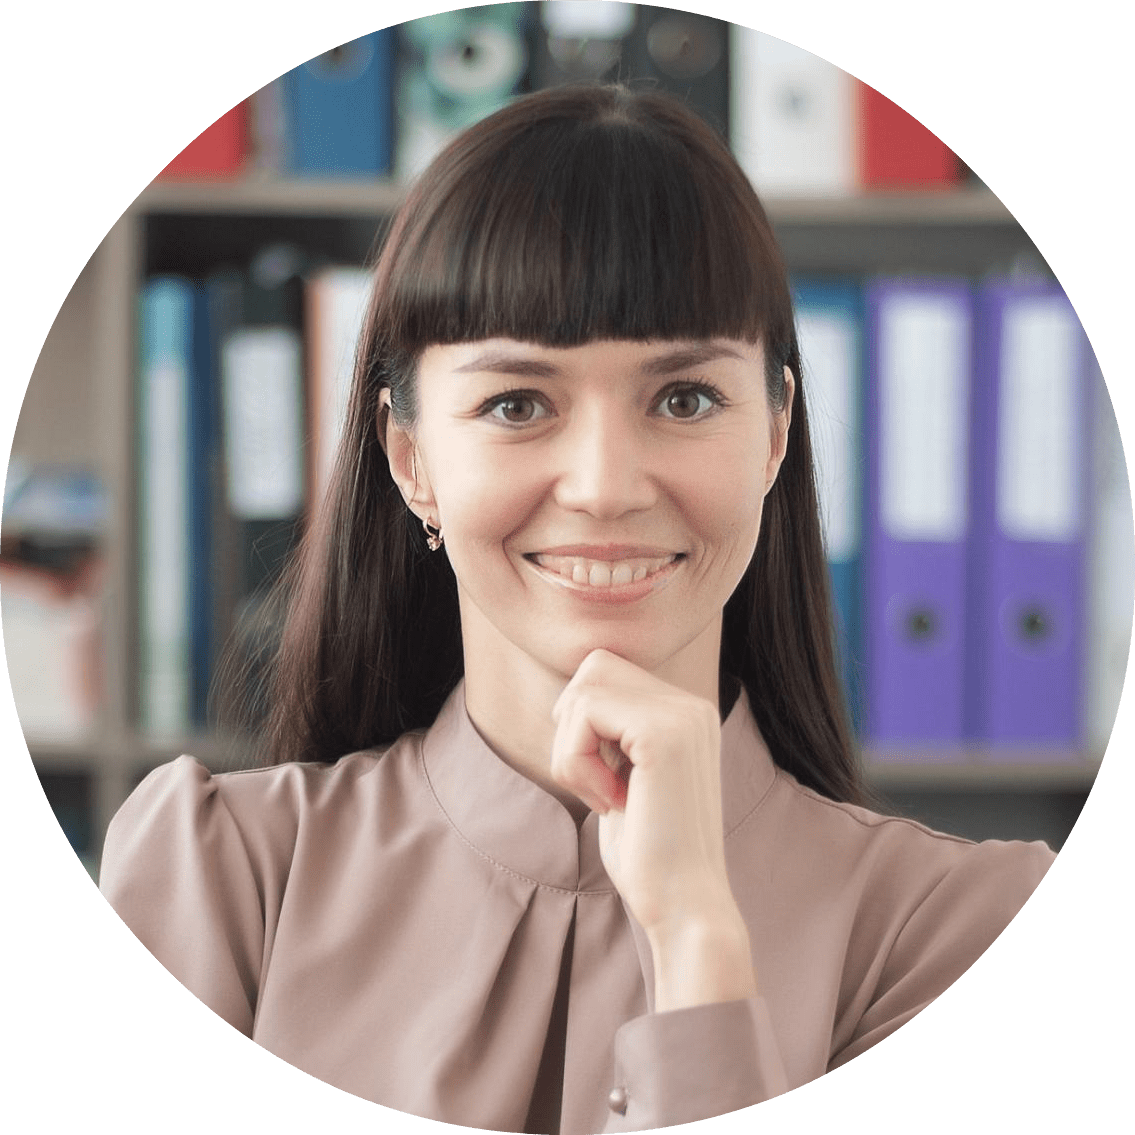 Лейля Хасаншина